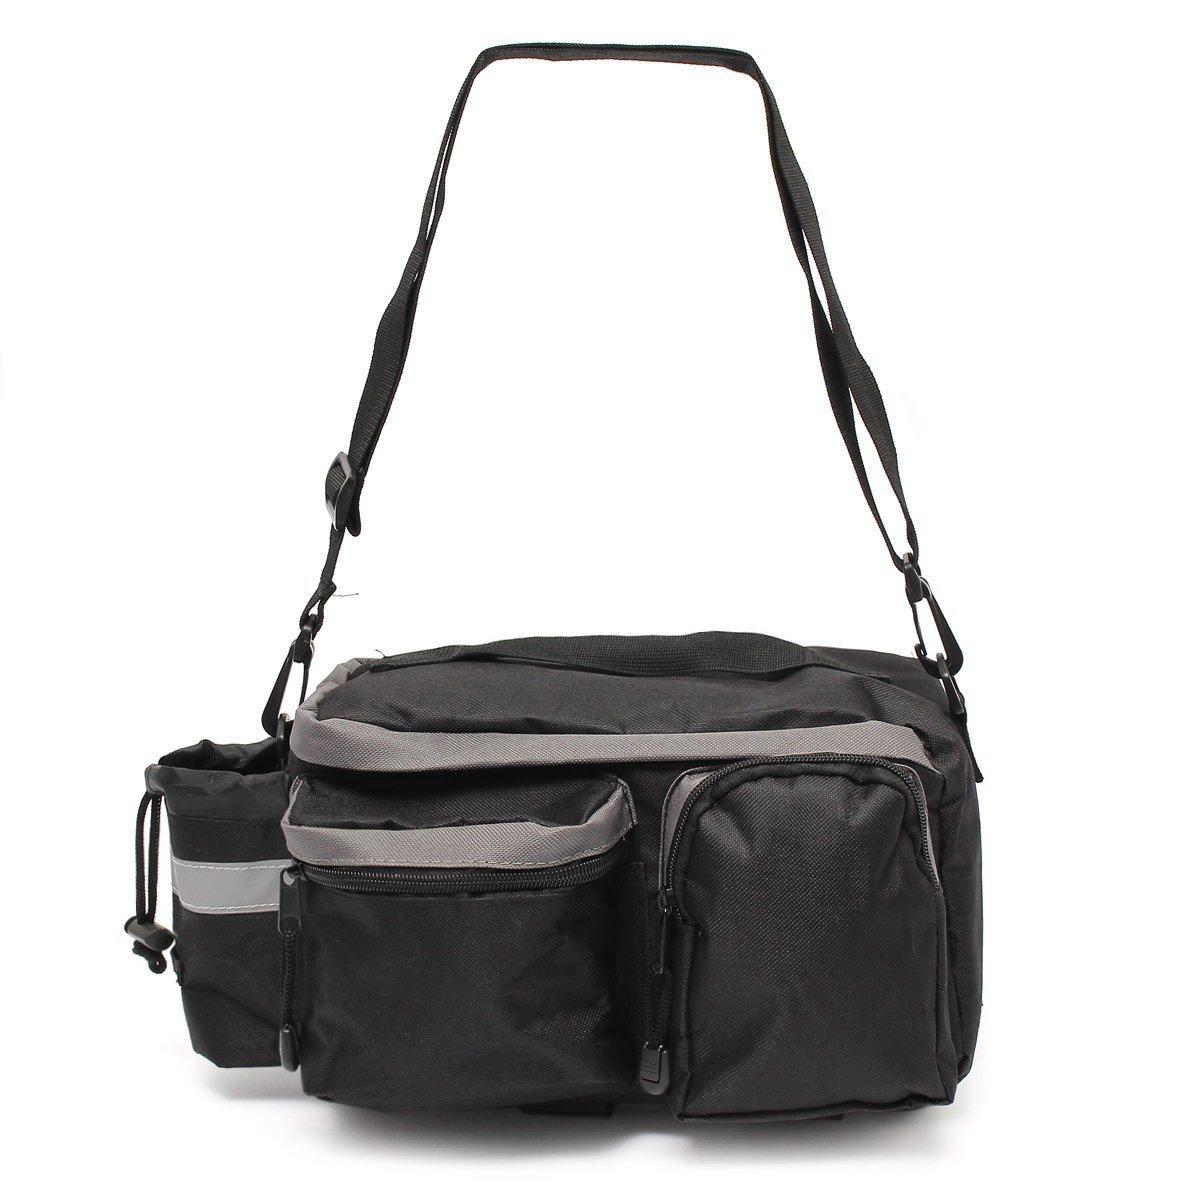 TraderPlus Bike Pannier Bag - Durable & Waterproof Nylon with Reflector Handbag | Shoulder Strap Rack Rear Trunk Tote Bag | Strong Velcro, Zipper Pockets & Bottle Case by TRADERPLUS (Image #2)